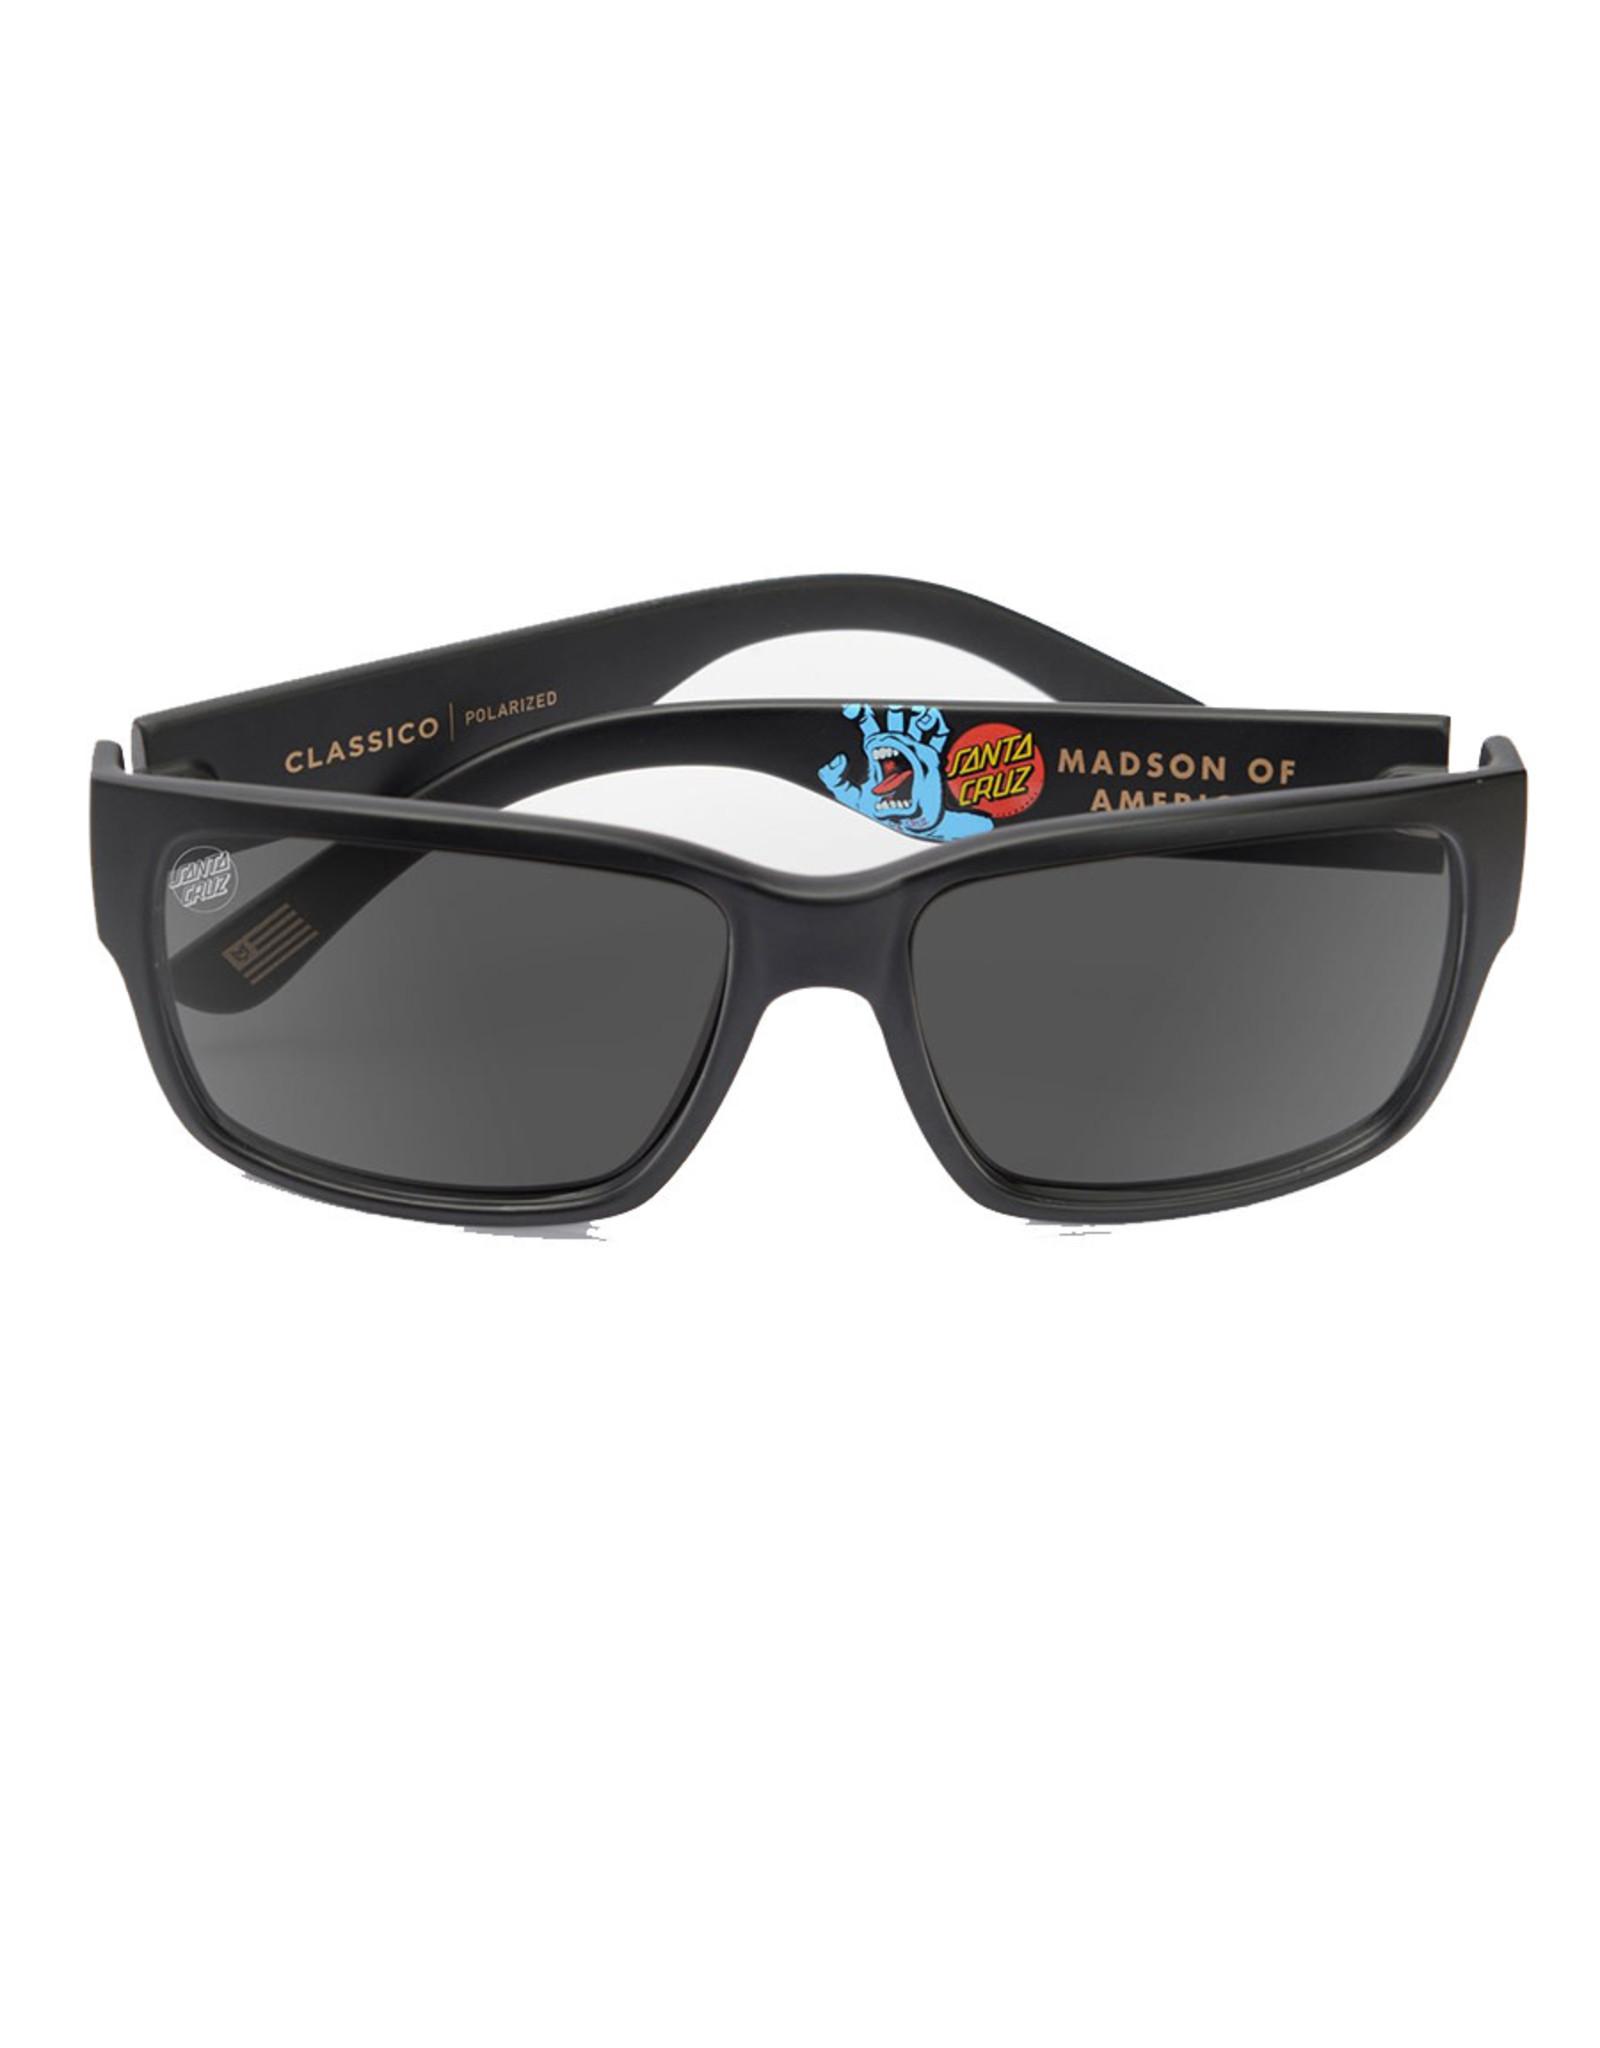 Madson Madson Sunglasses Classico Santa Cruz Screaming Hand (Black Matte/Grey Polarized Lens)